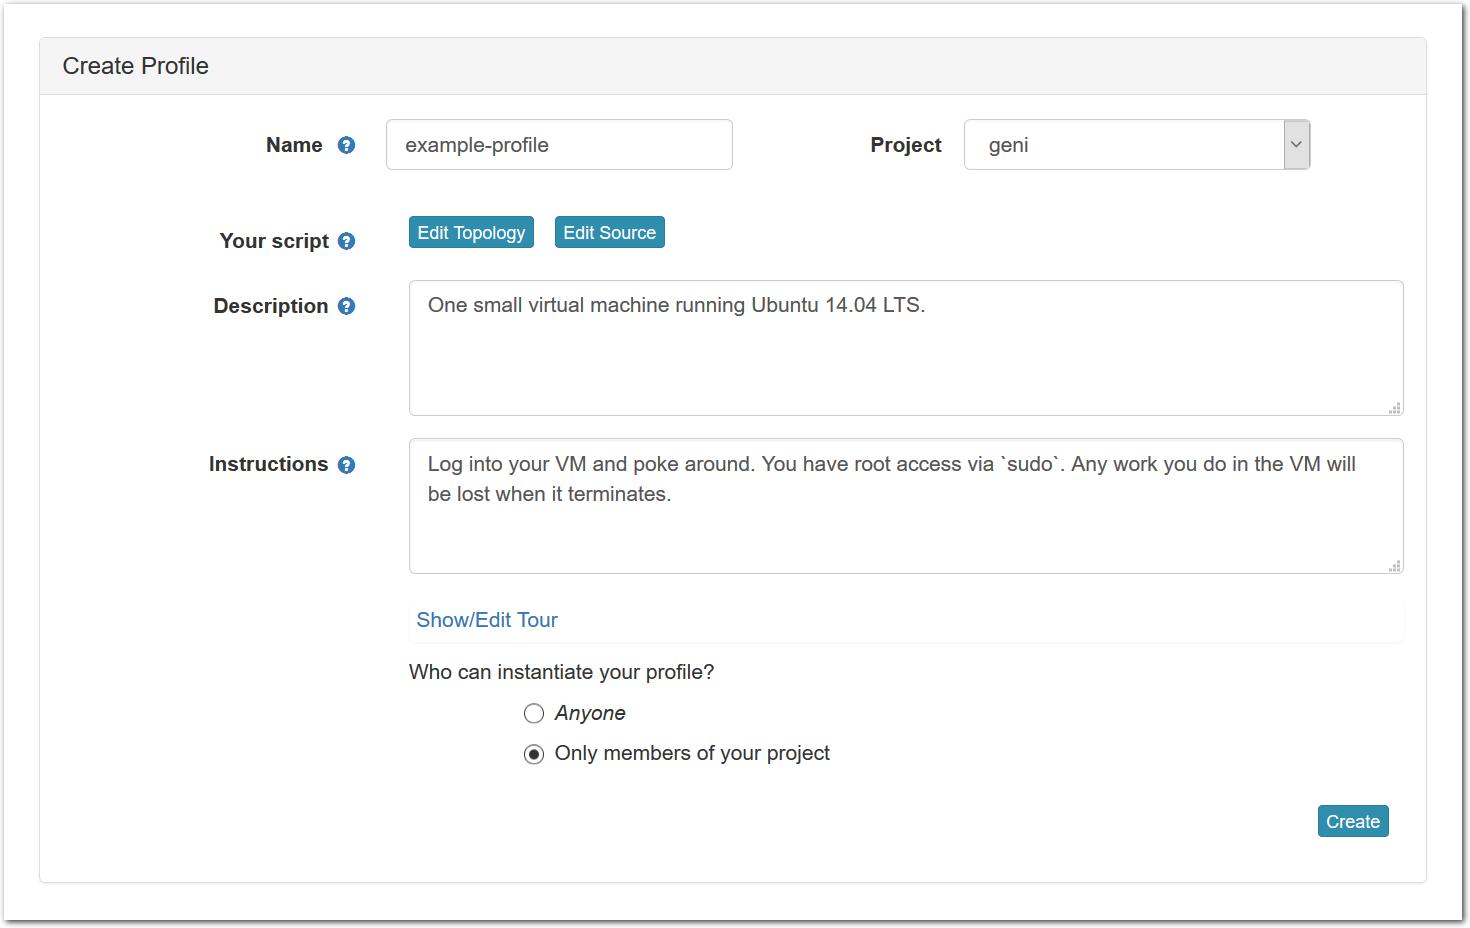 screenshots/pnet/create-profile-form.png